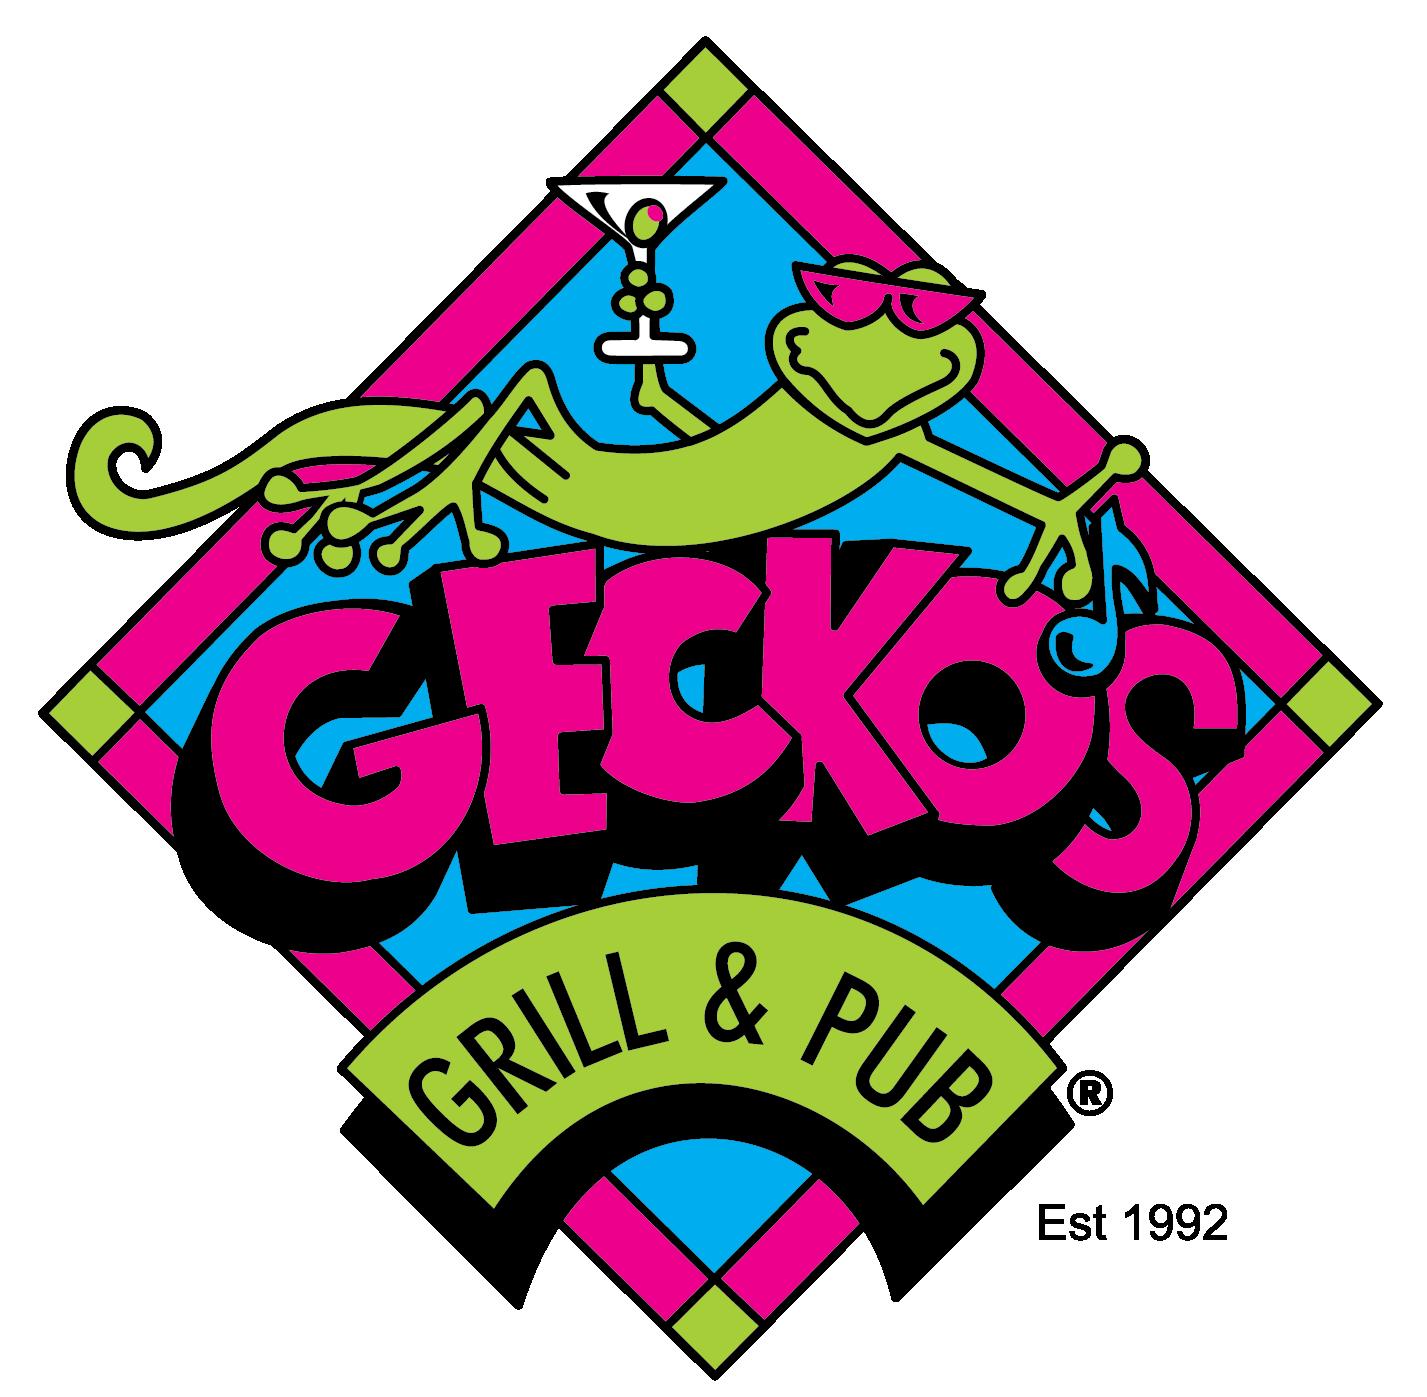 Geckos Grill & Pub Logo